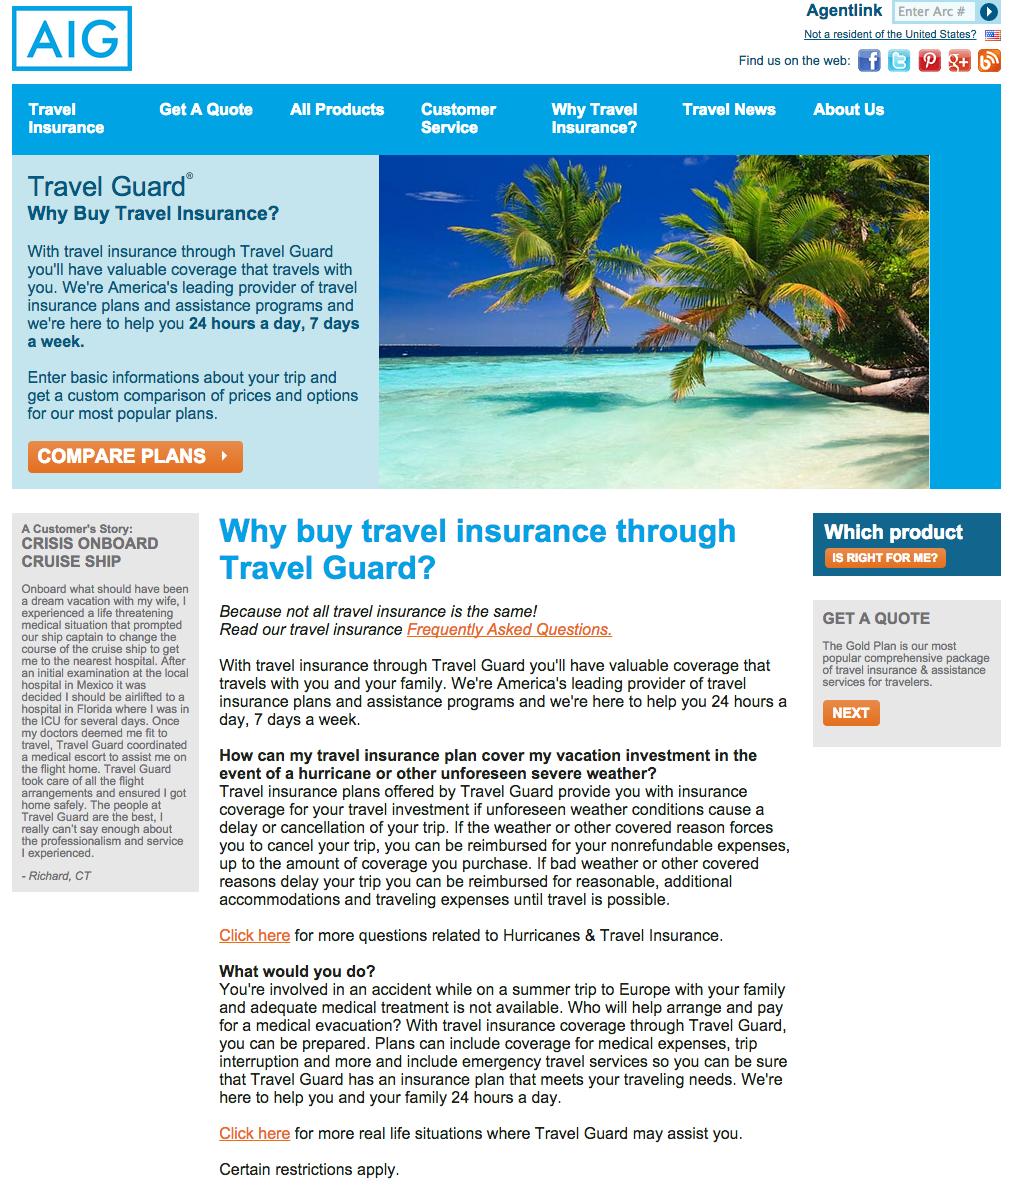 Travel Insurance Travel Guard Trip Insurance Medical